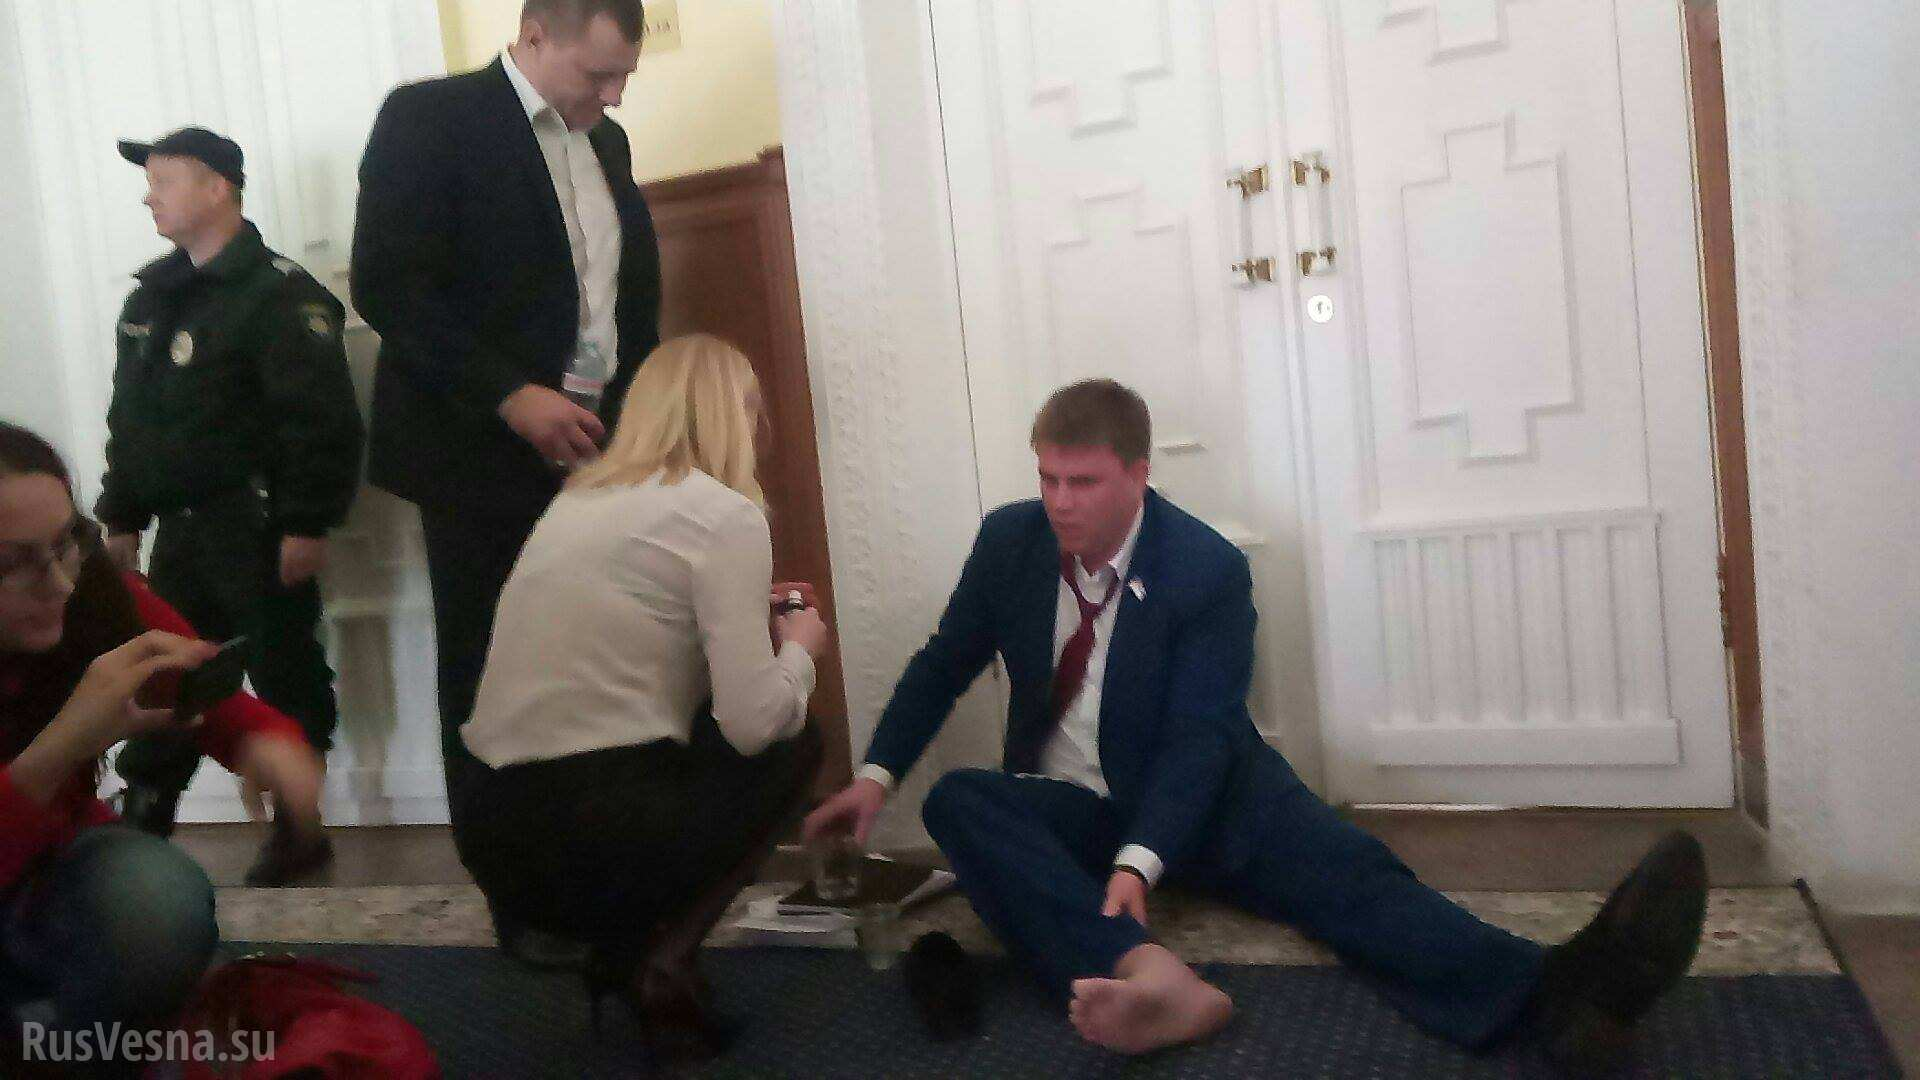 Охрана Кернеса вынесла депутата-антифашиста из зала горсовета (ФОТО, ВИДЕО)